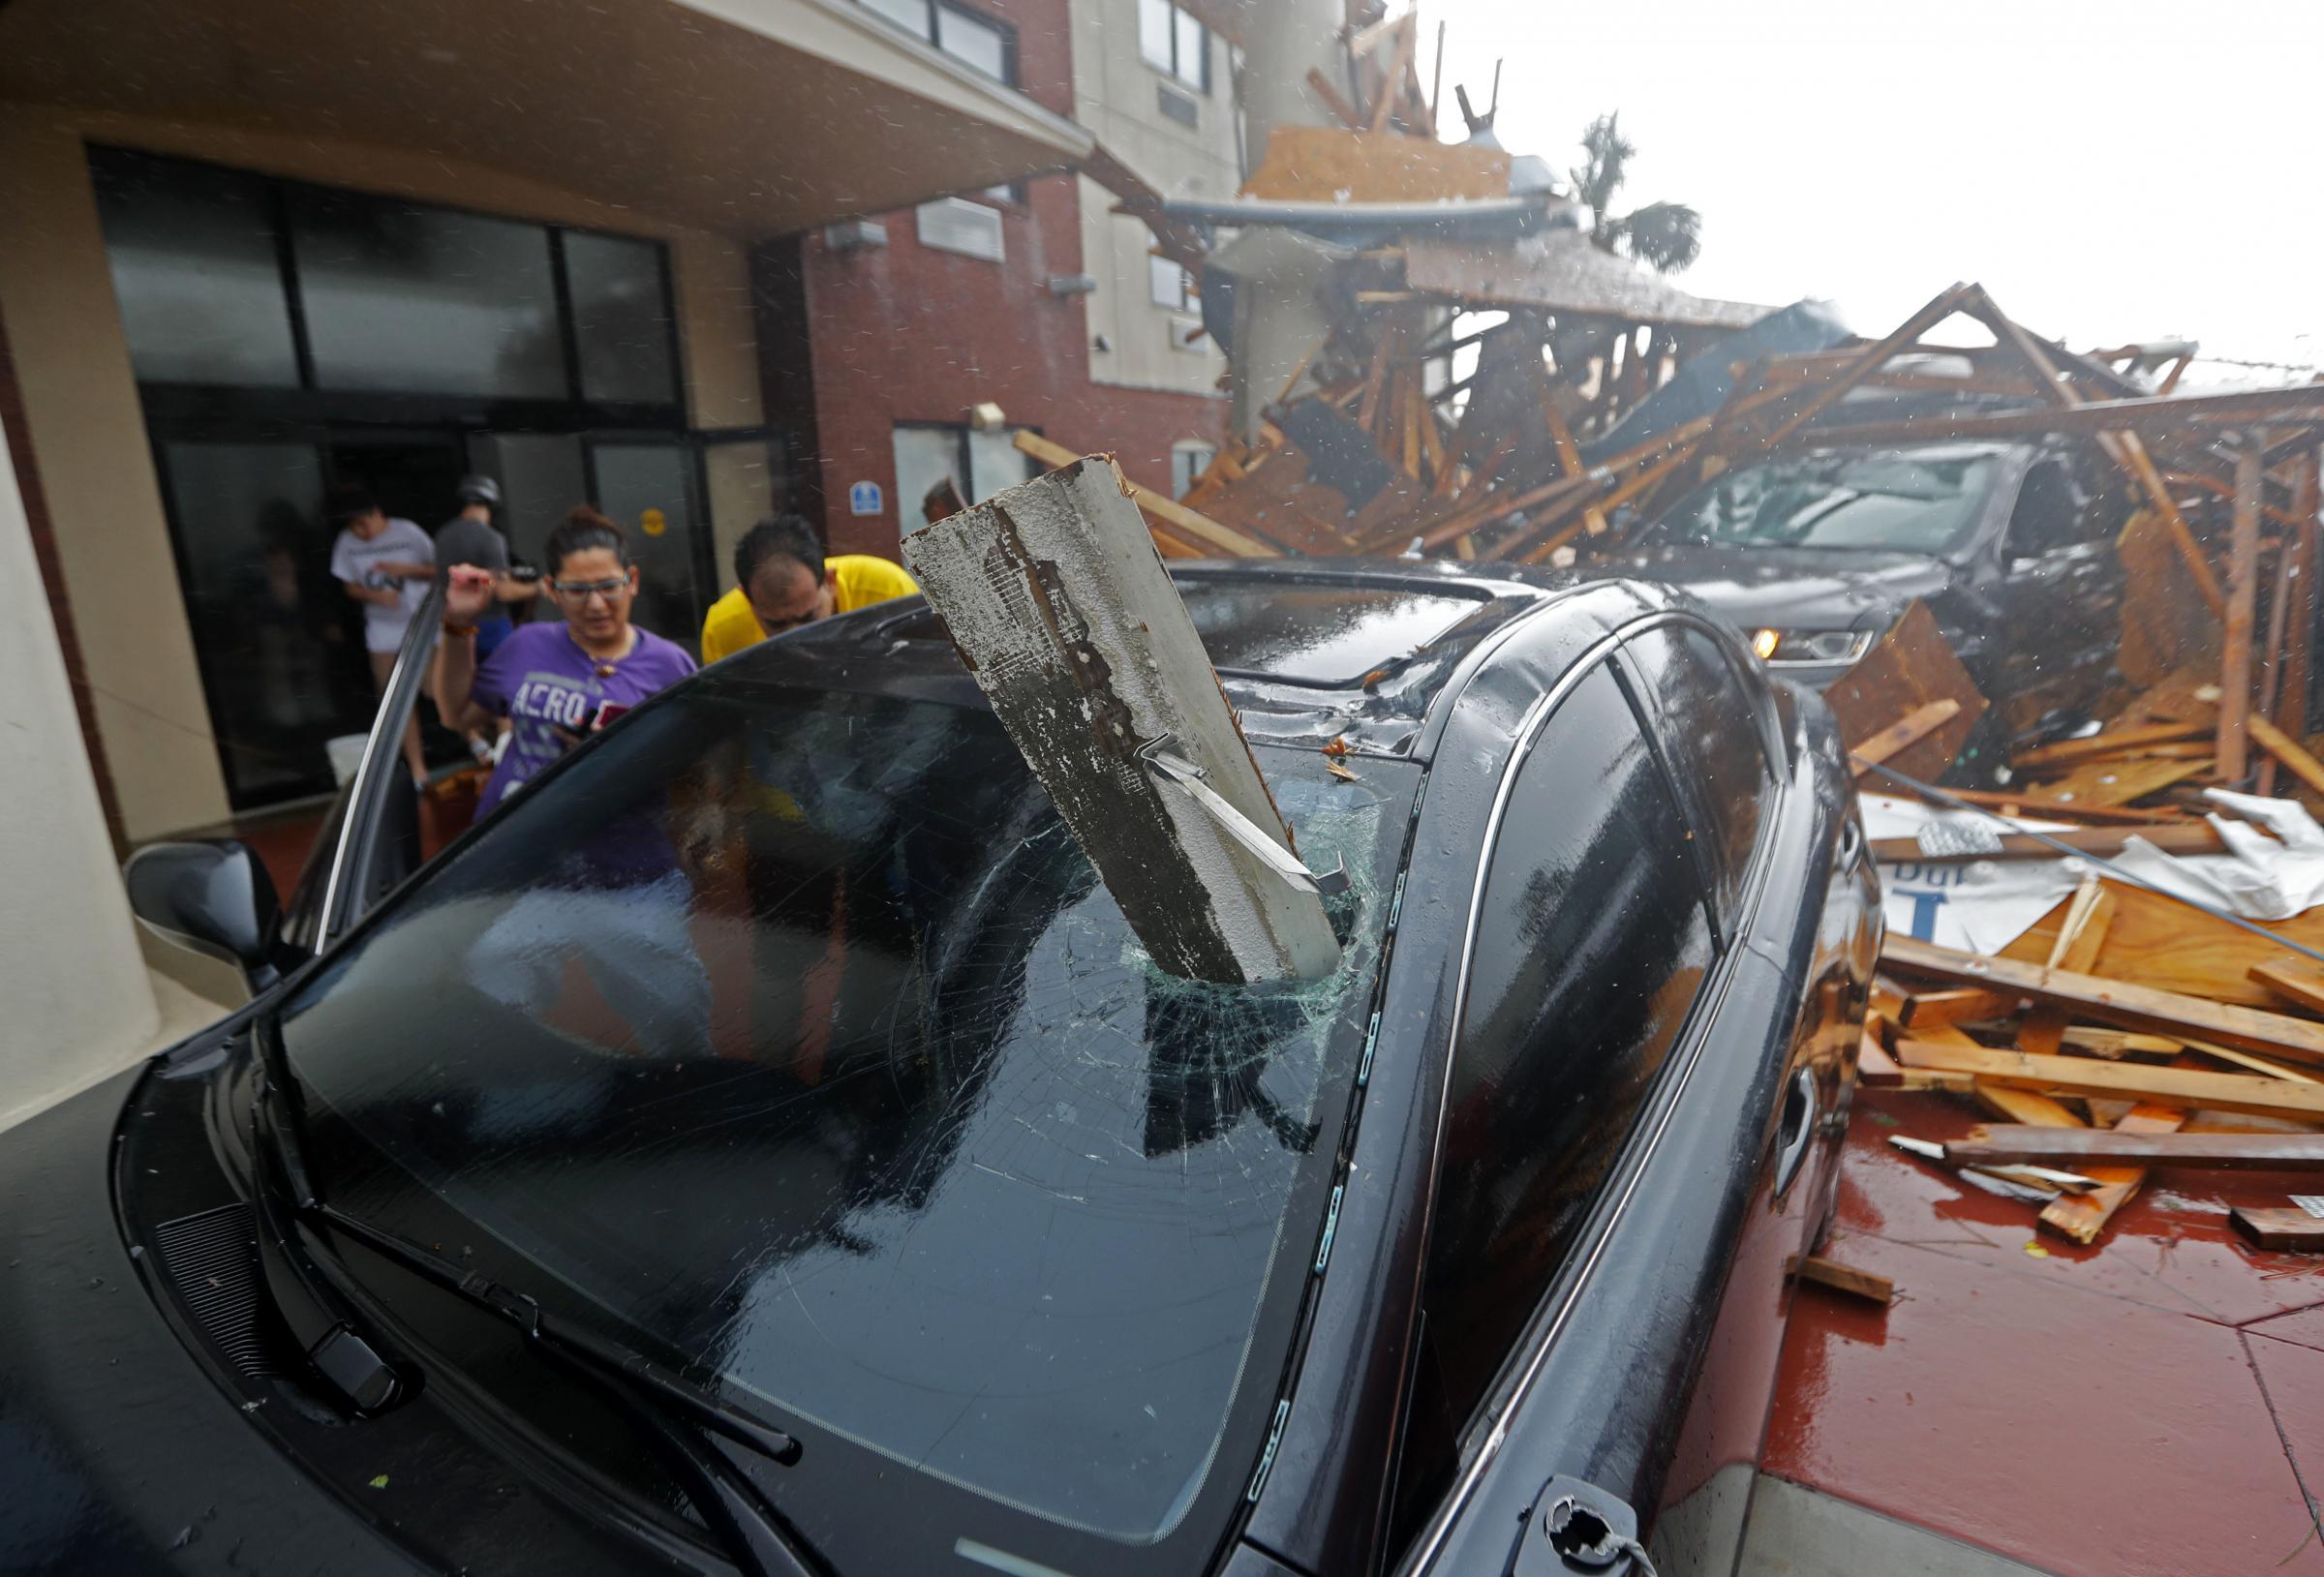 'Unimaginable destruction': Hurricane smashes rows of houses